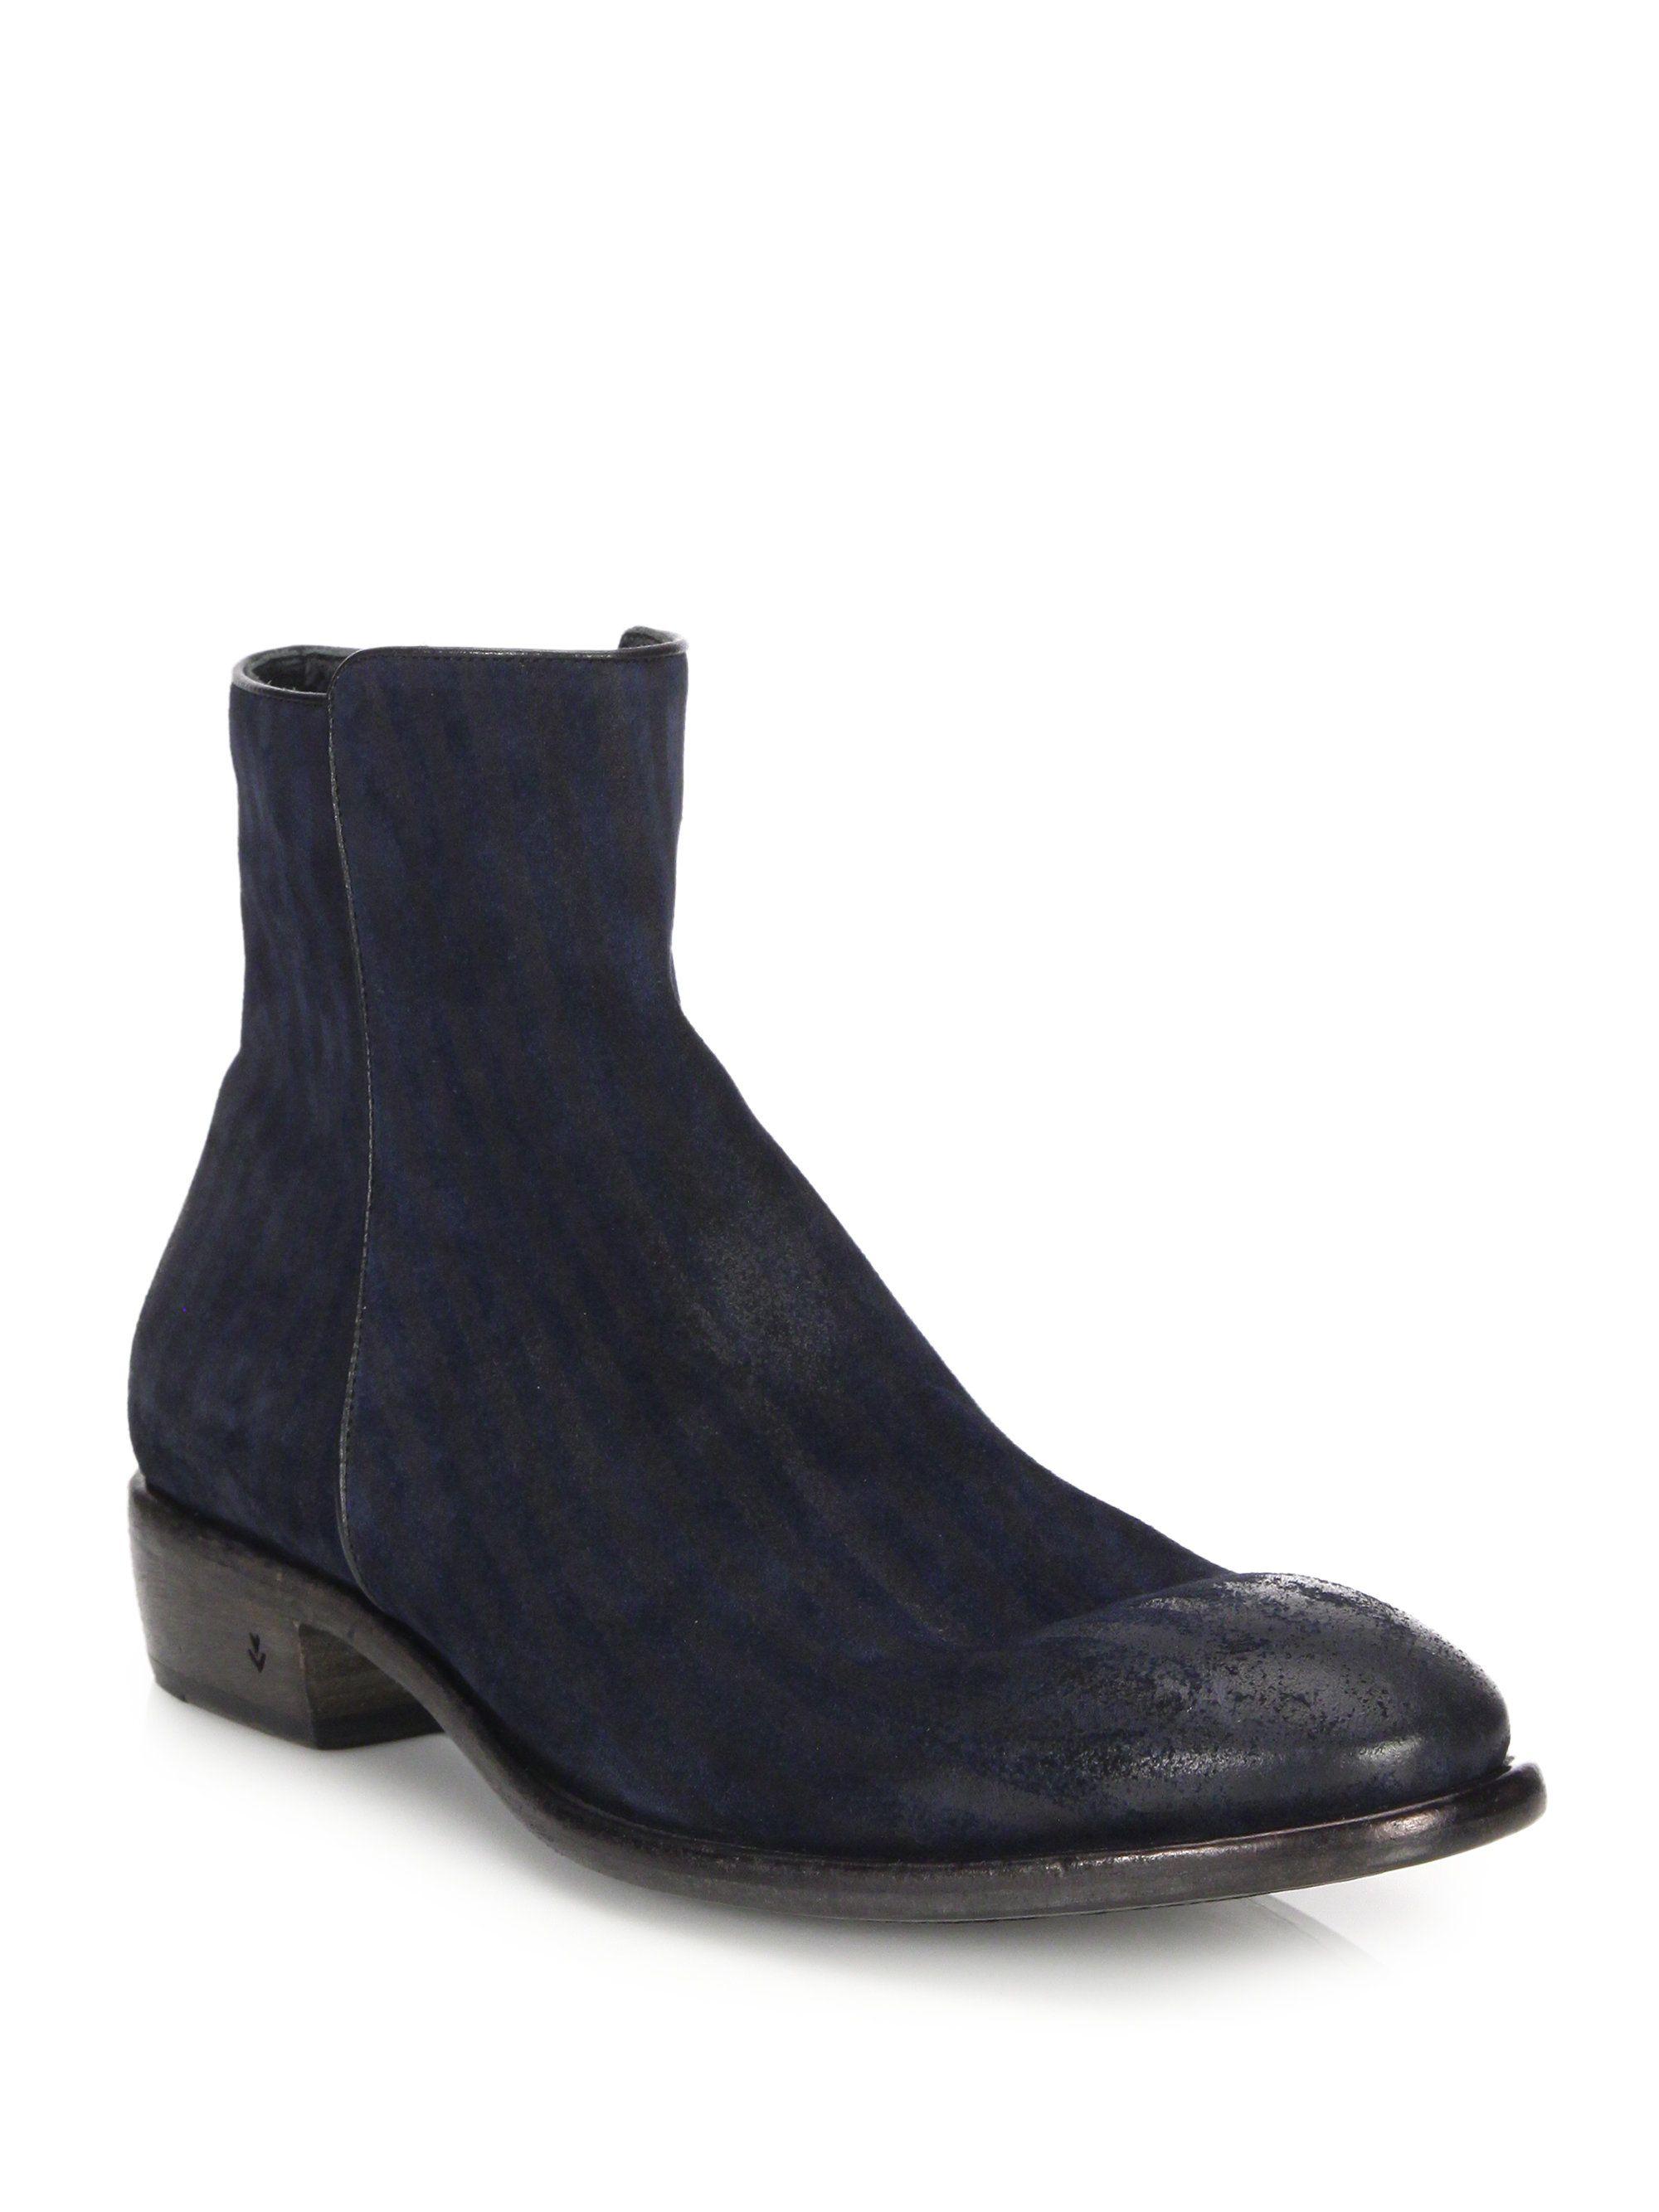 Womens High Heels John Varvatos Keith Suede Boots Heels johnvarvatos Outlet Sale